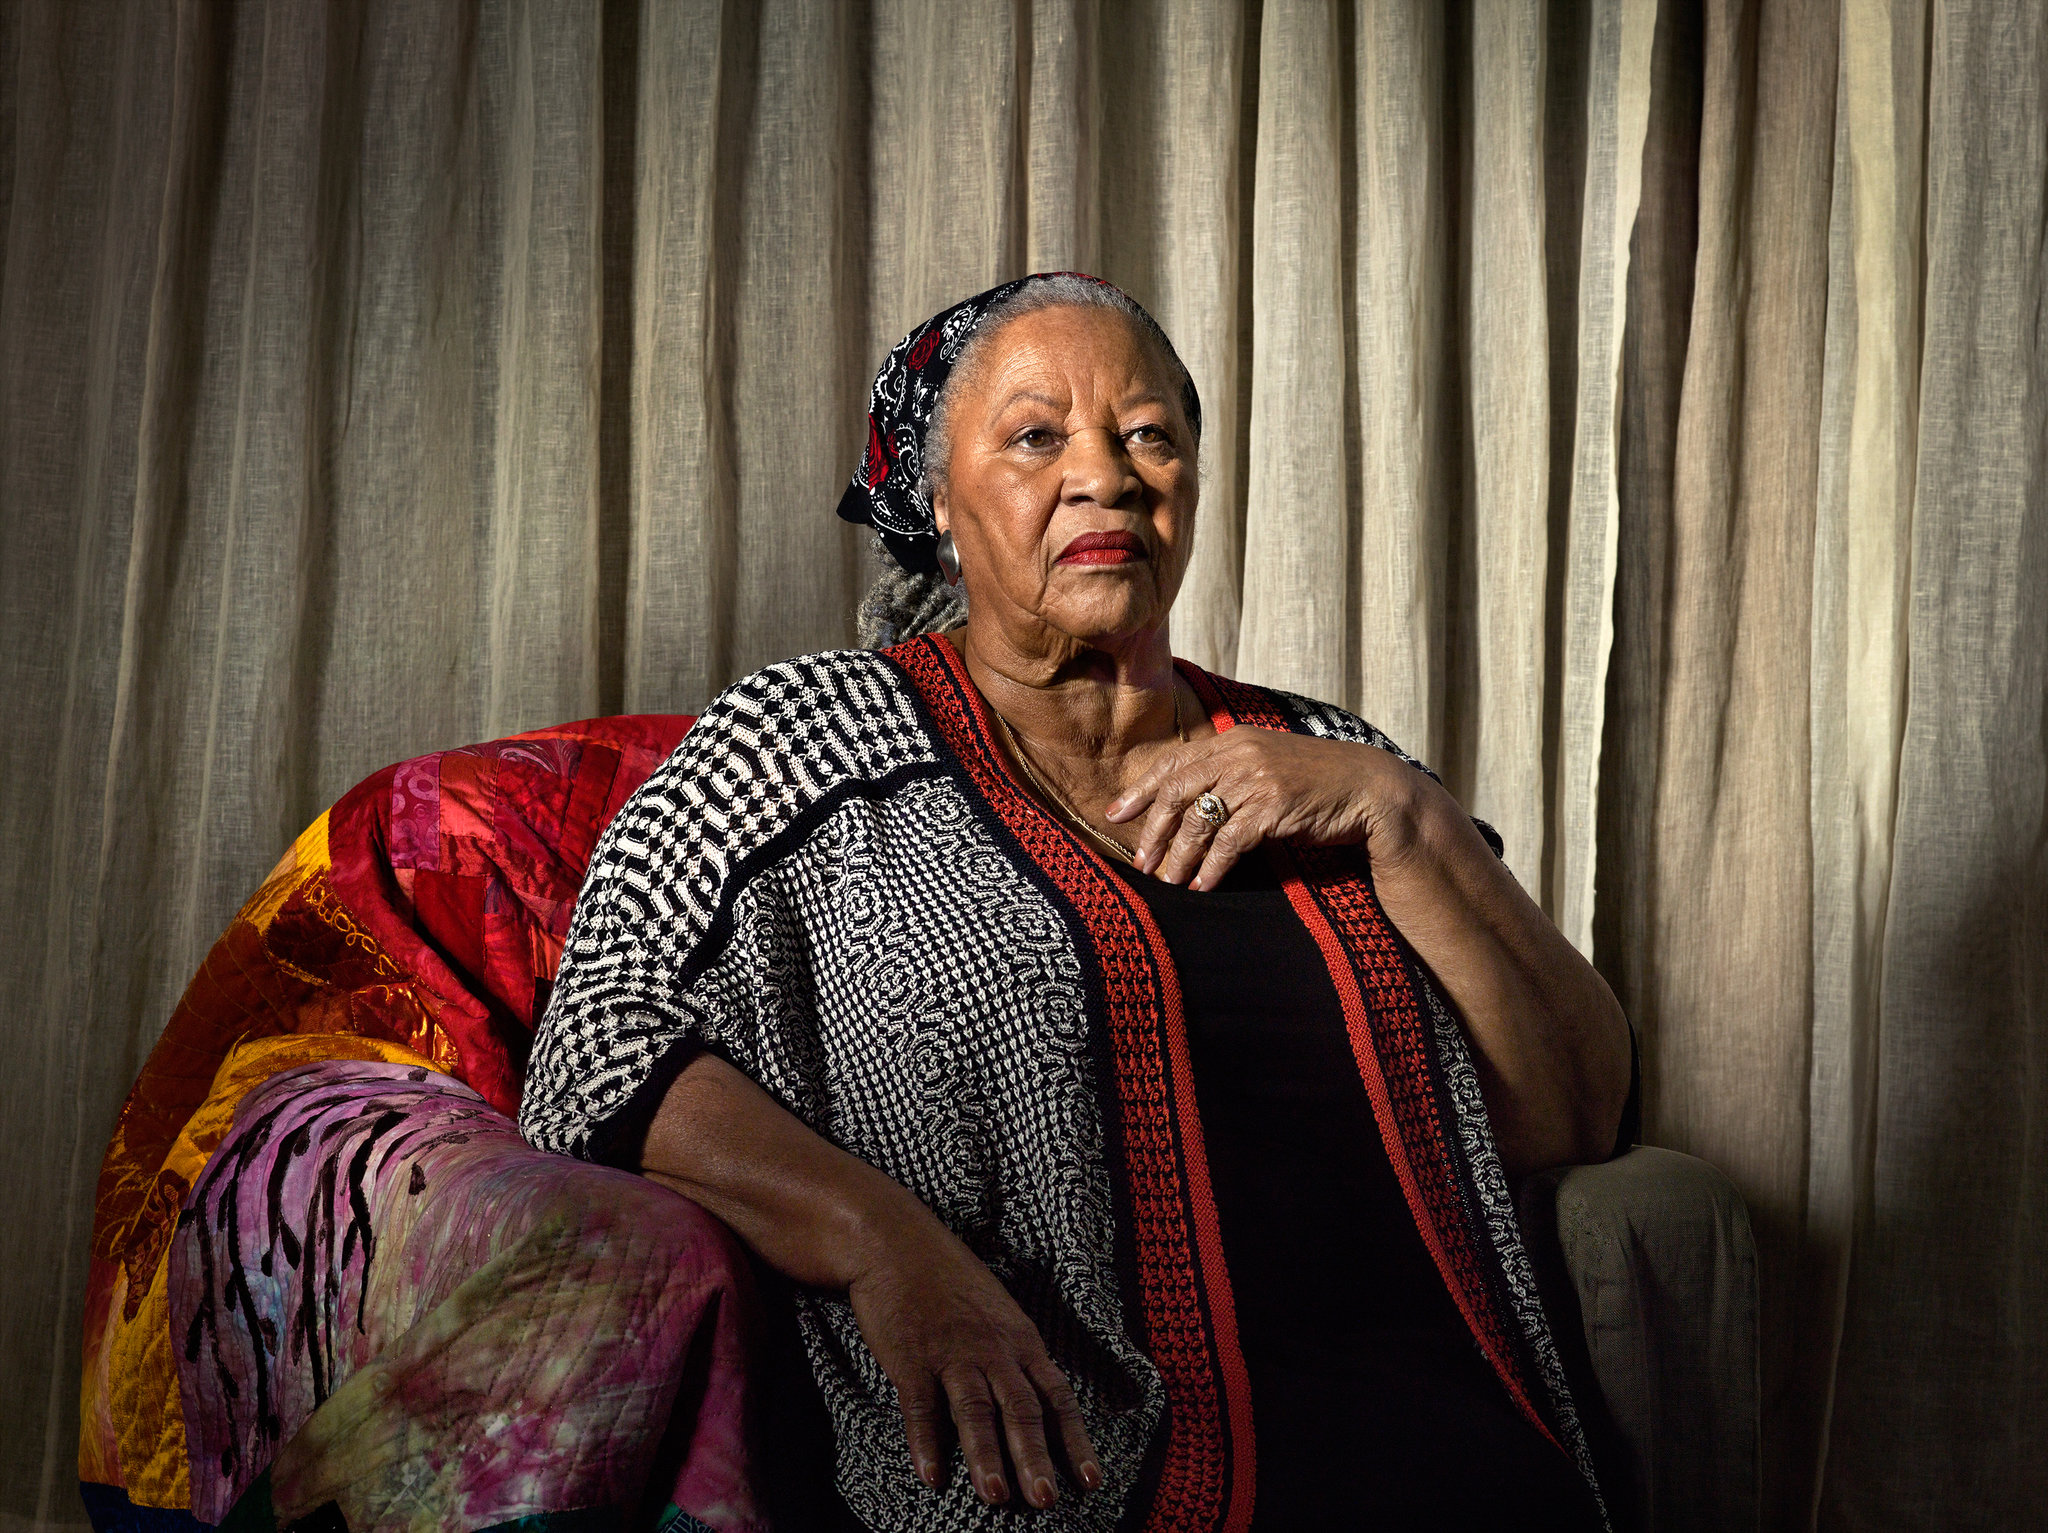 Toni Morrison, 2015, Katy Grannan/NYTimes